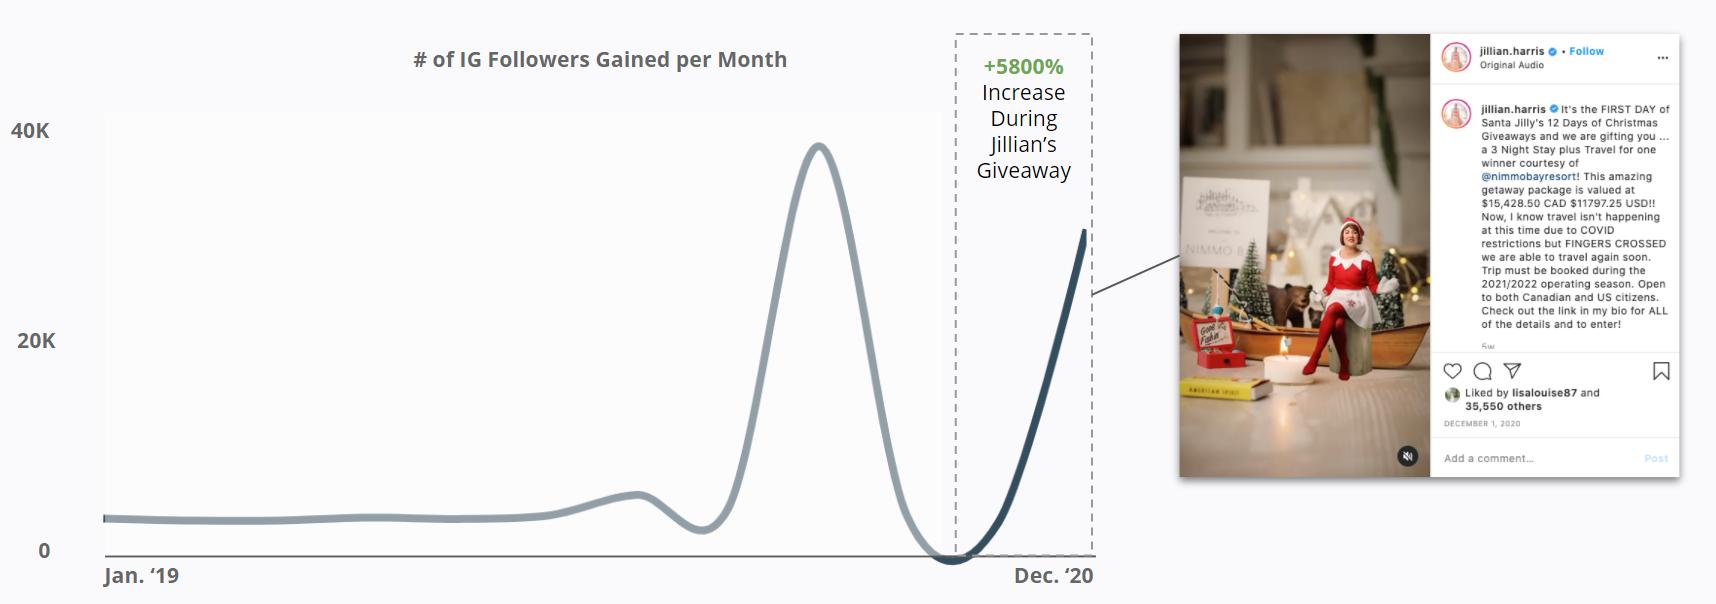 Jillian Harris - # of IG Followers Gained per Month